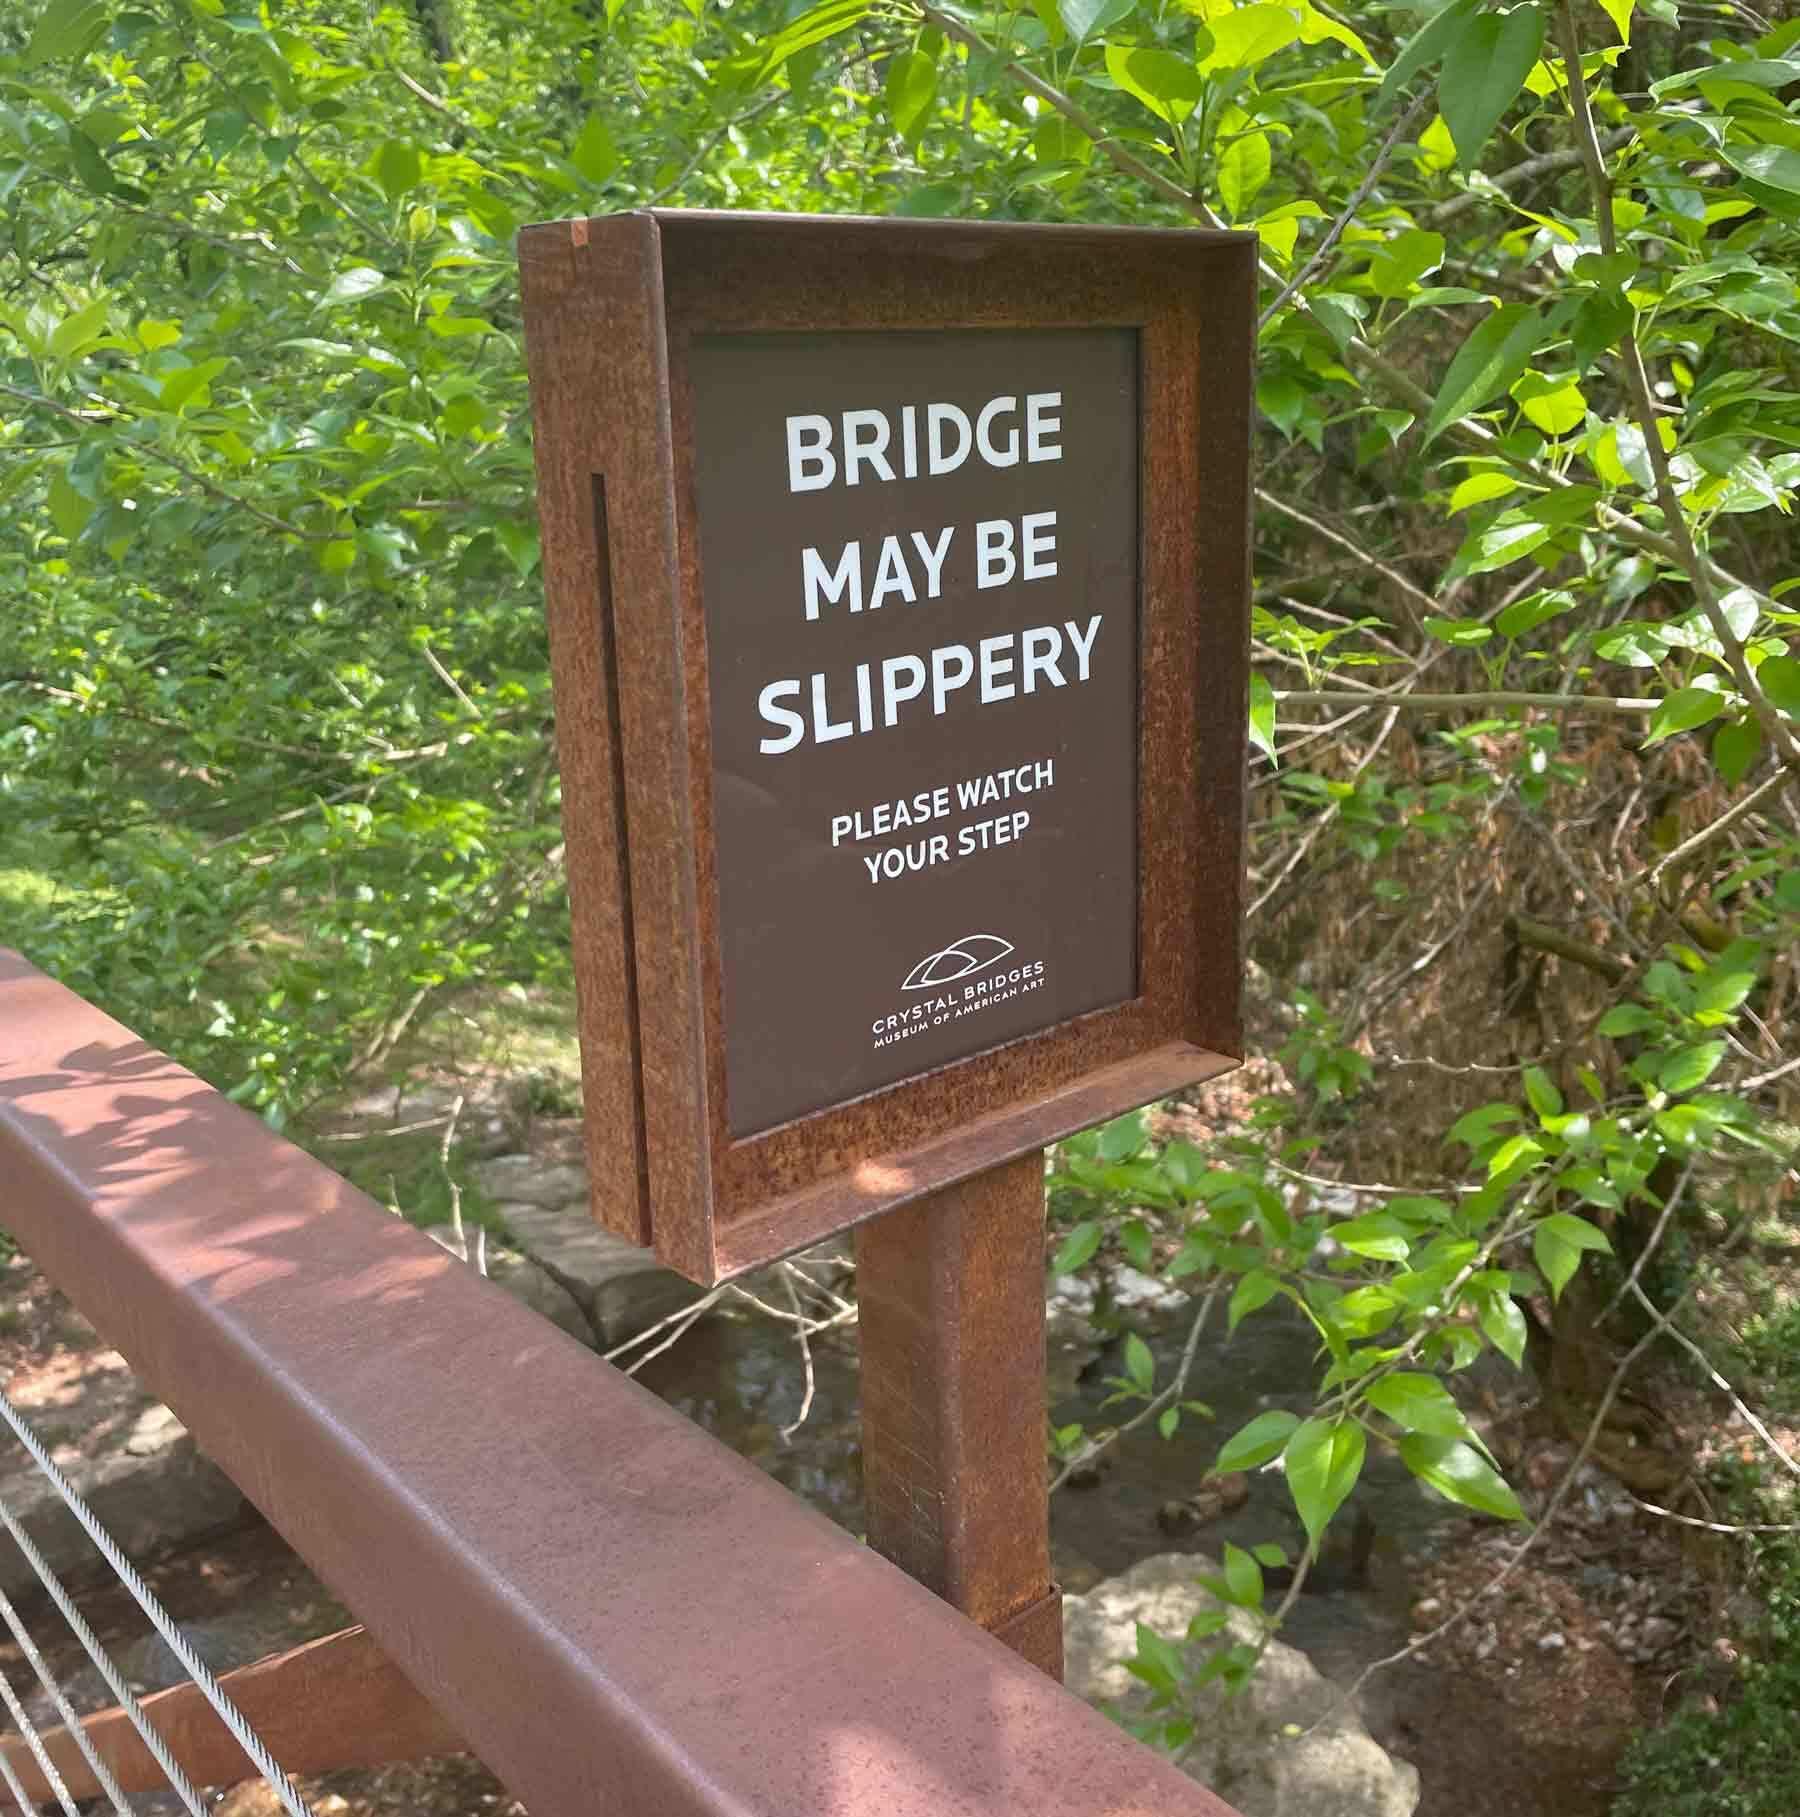 Bridge may be slippery sign